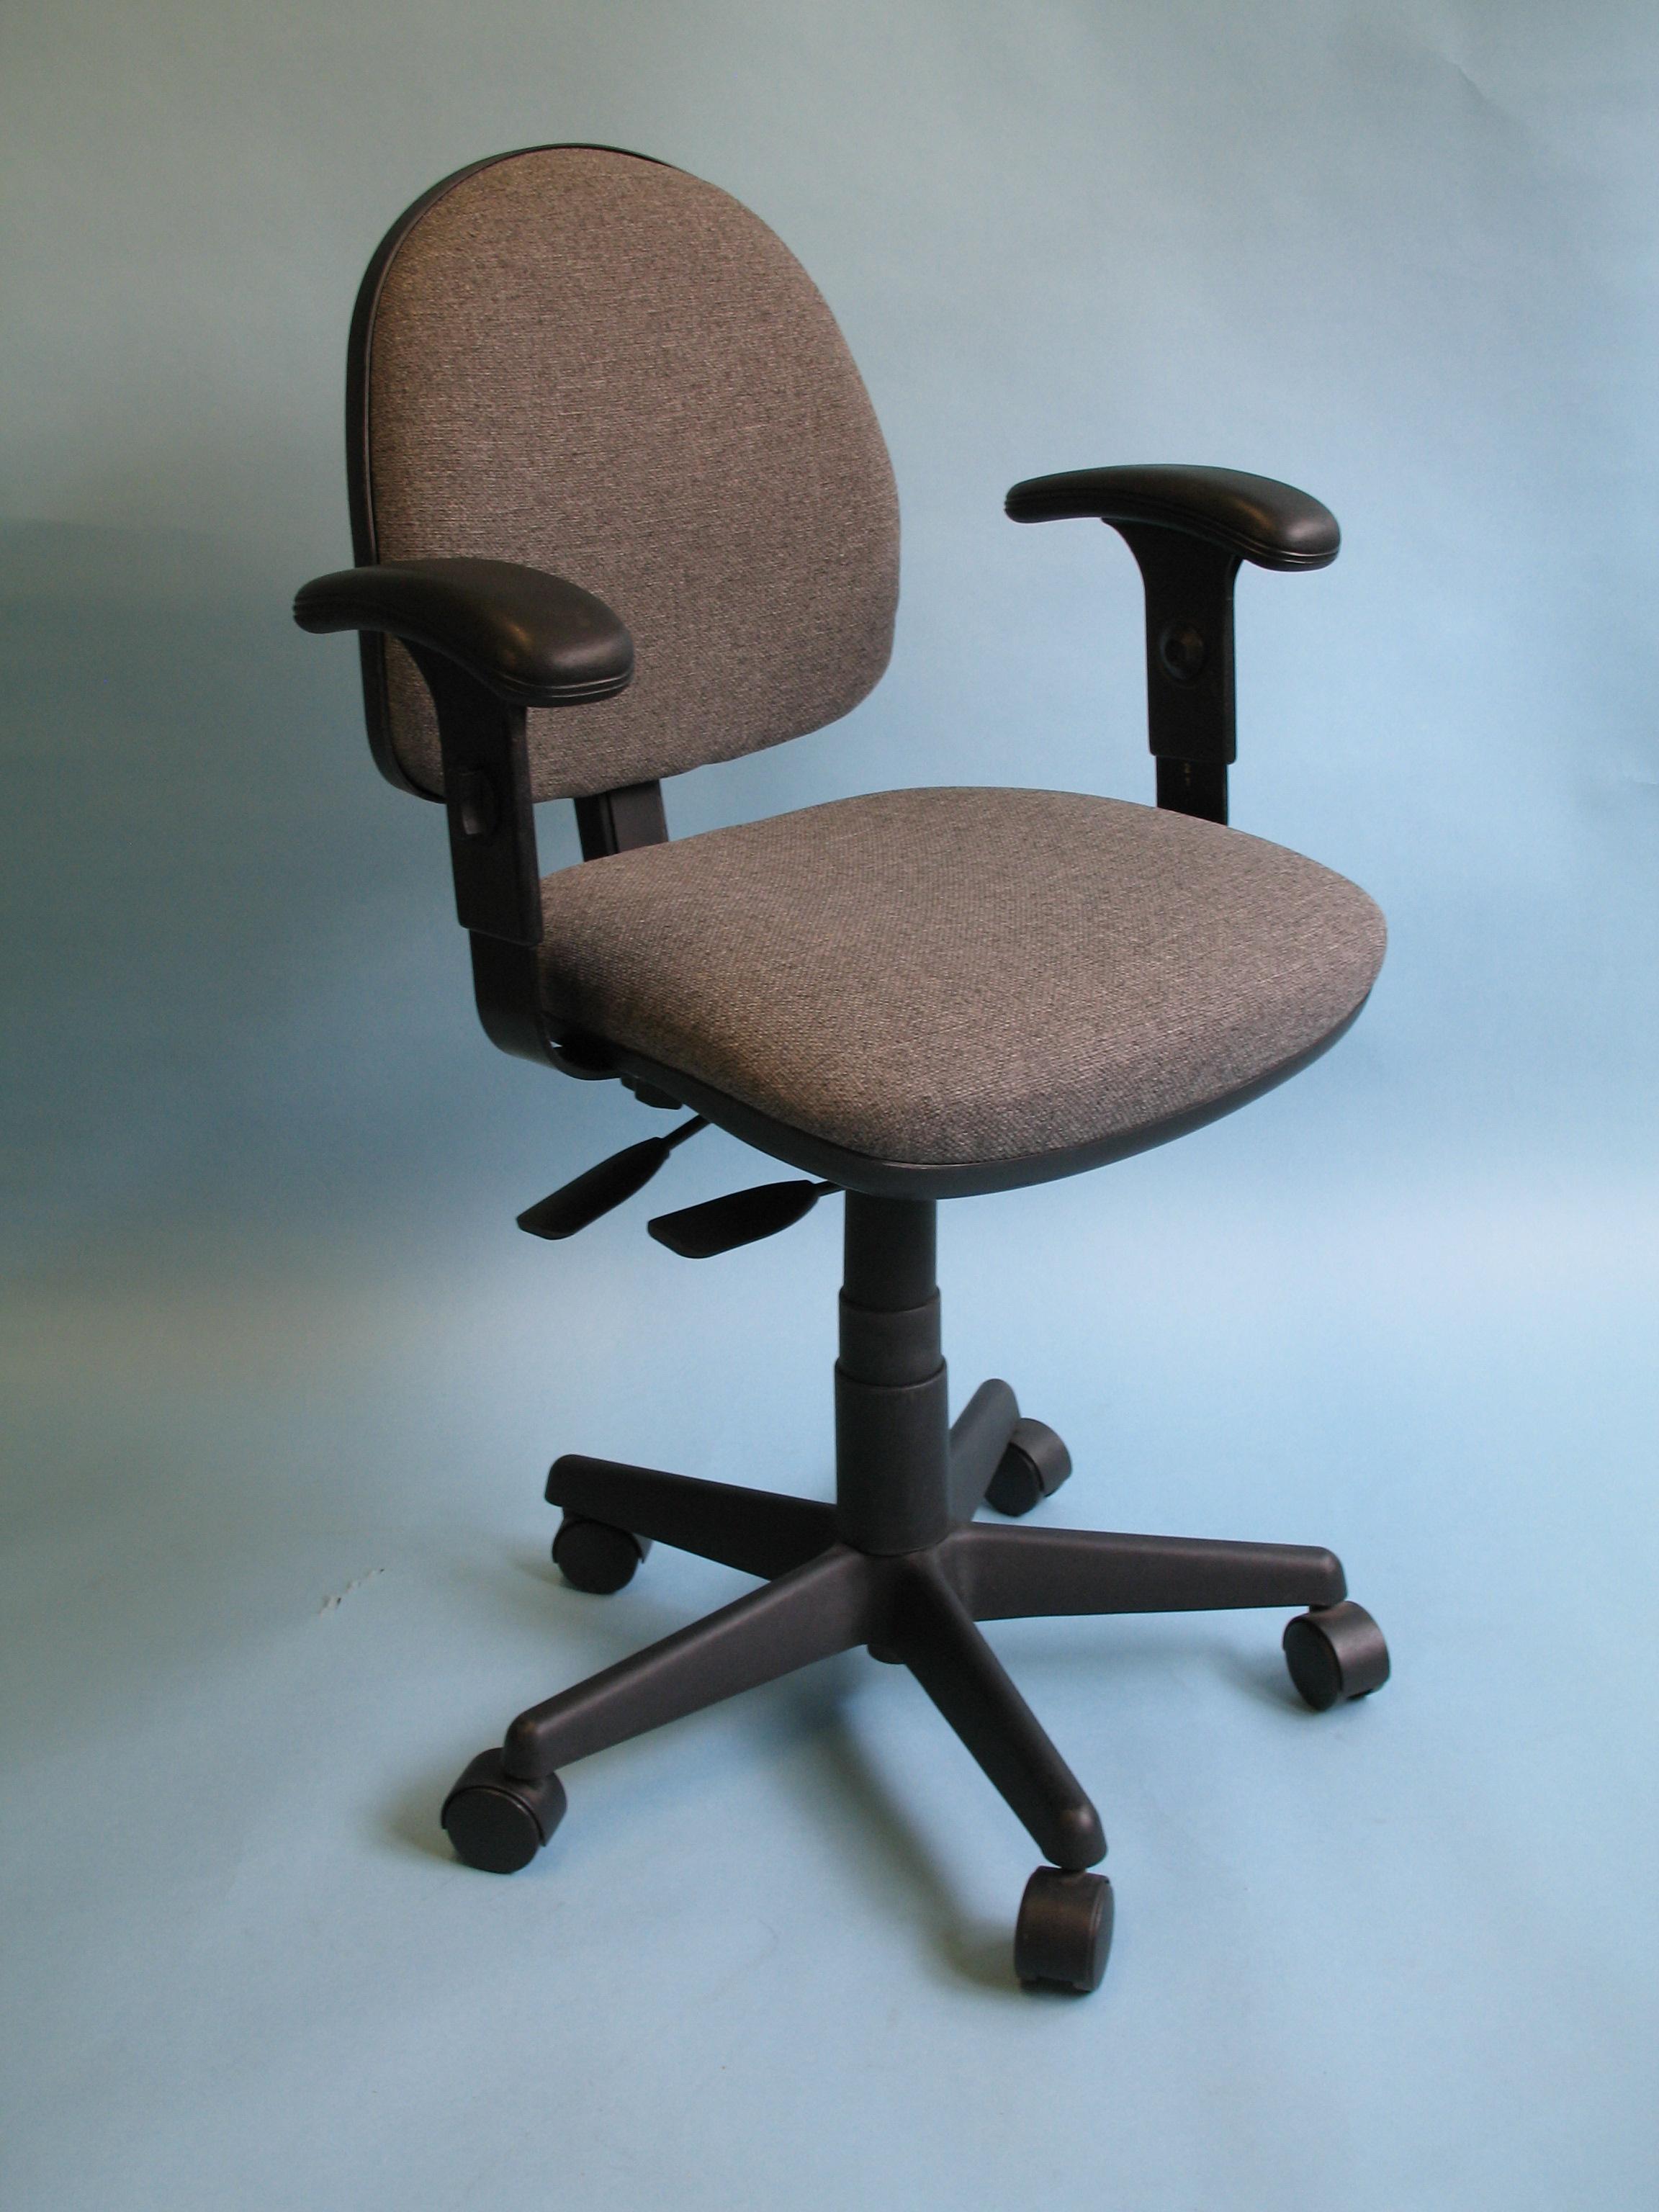 Brandt 13419 Ergonomic Task Chair W/ Adjustable Arm Rests